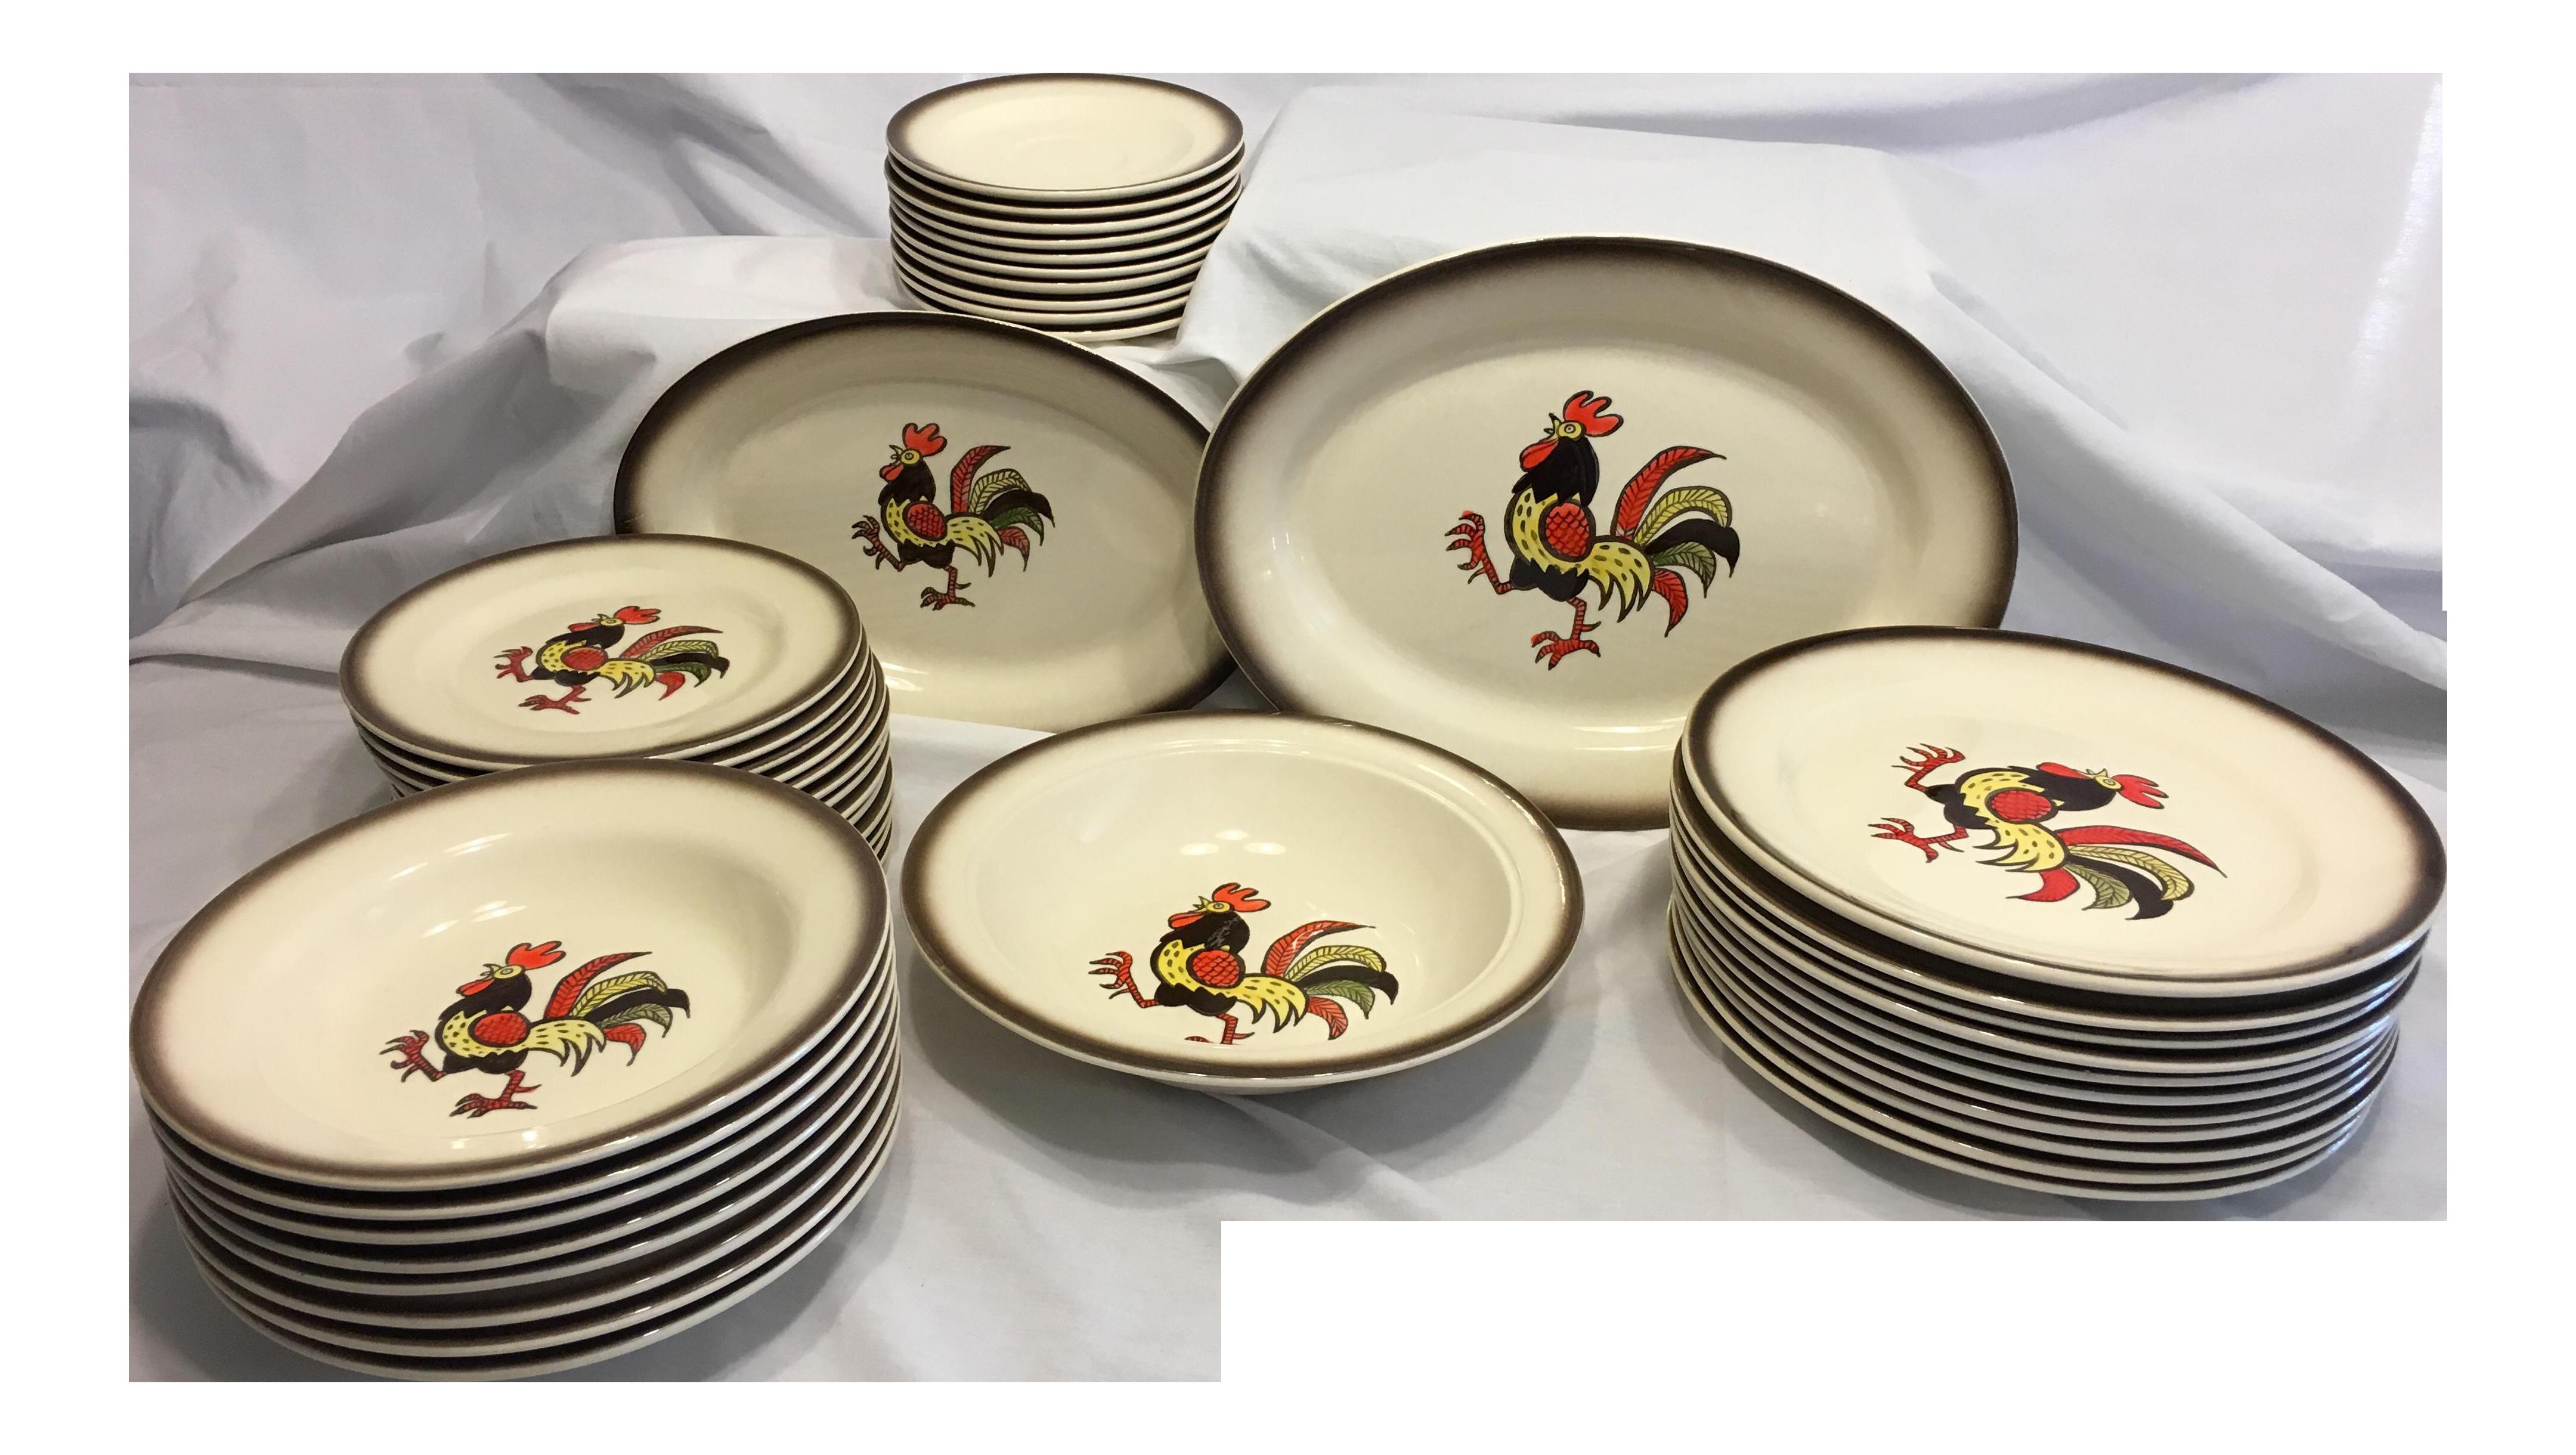 Poppytrail Rooster Pattern Metlox of California Dinnerware - Set of 44  sc 1 st  Chairish & Poppytrail Rooster Pattern Metlox of California Dinnerware - Set of ...